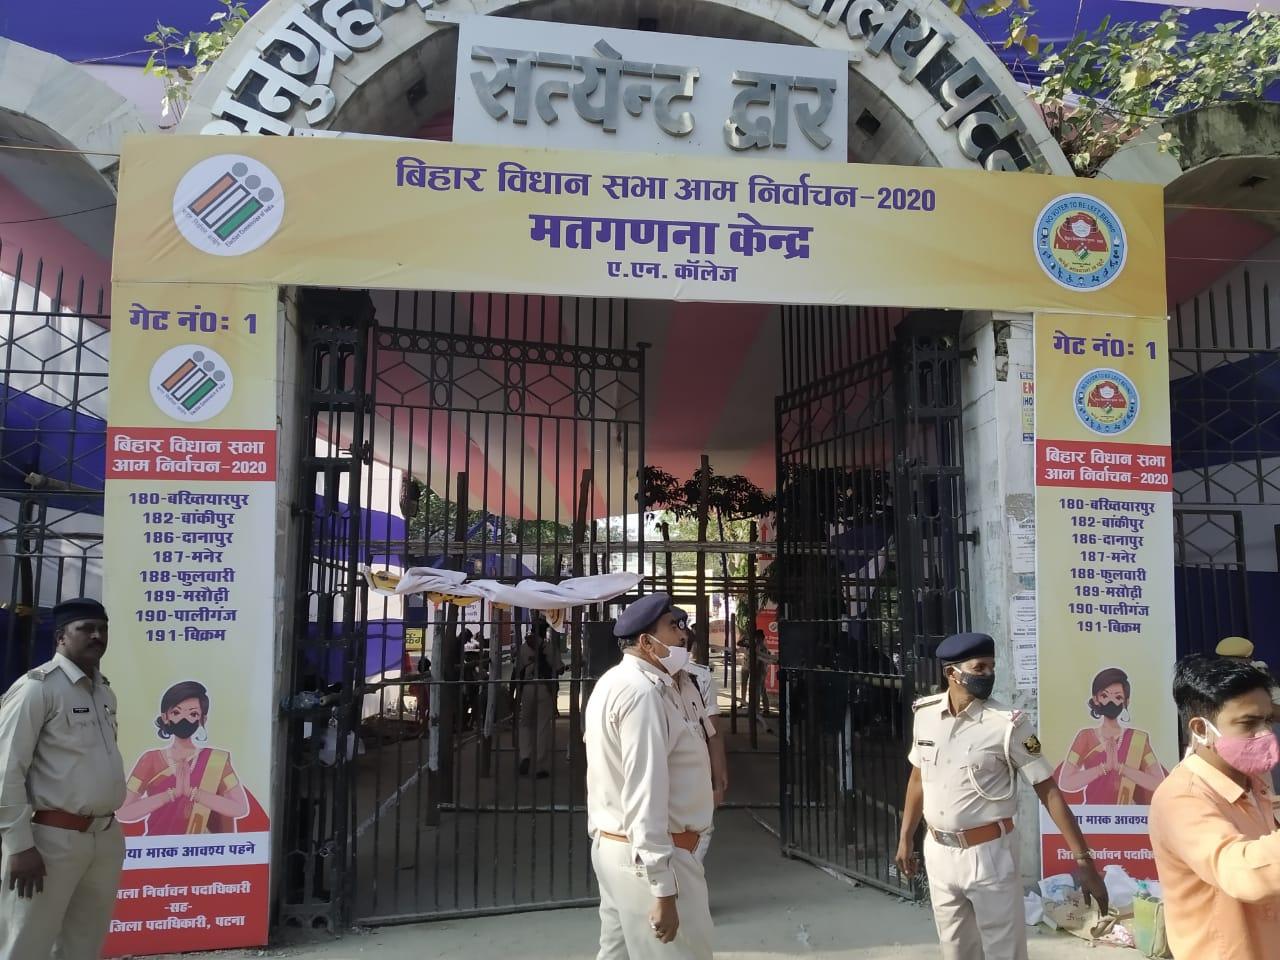 Counting centre established at Anugrah Narayan College in Patna